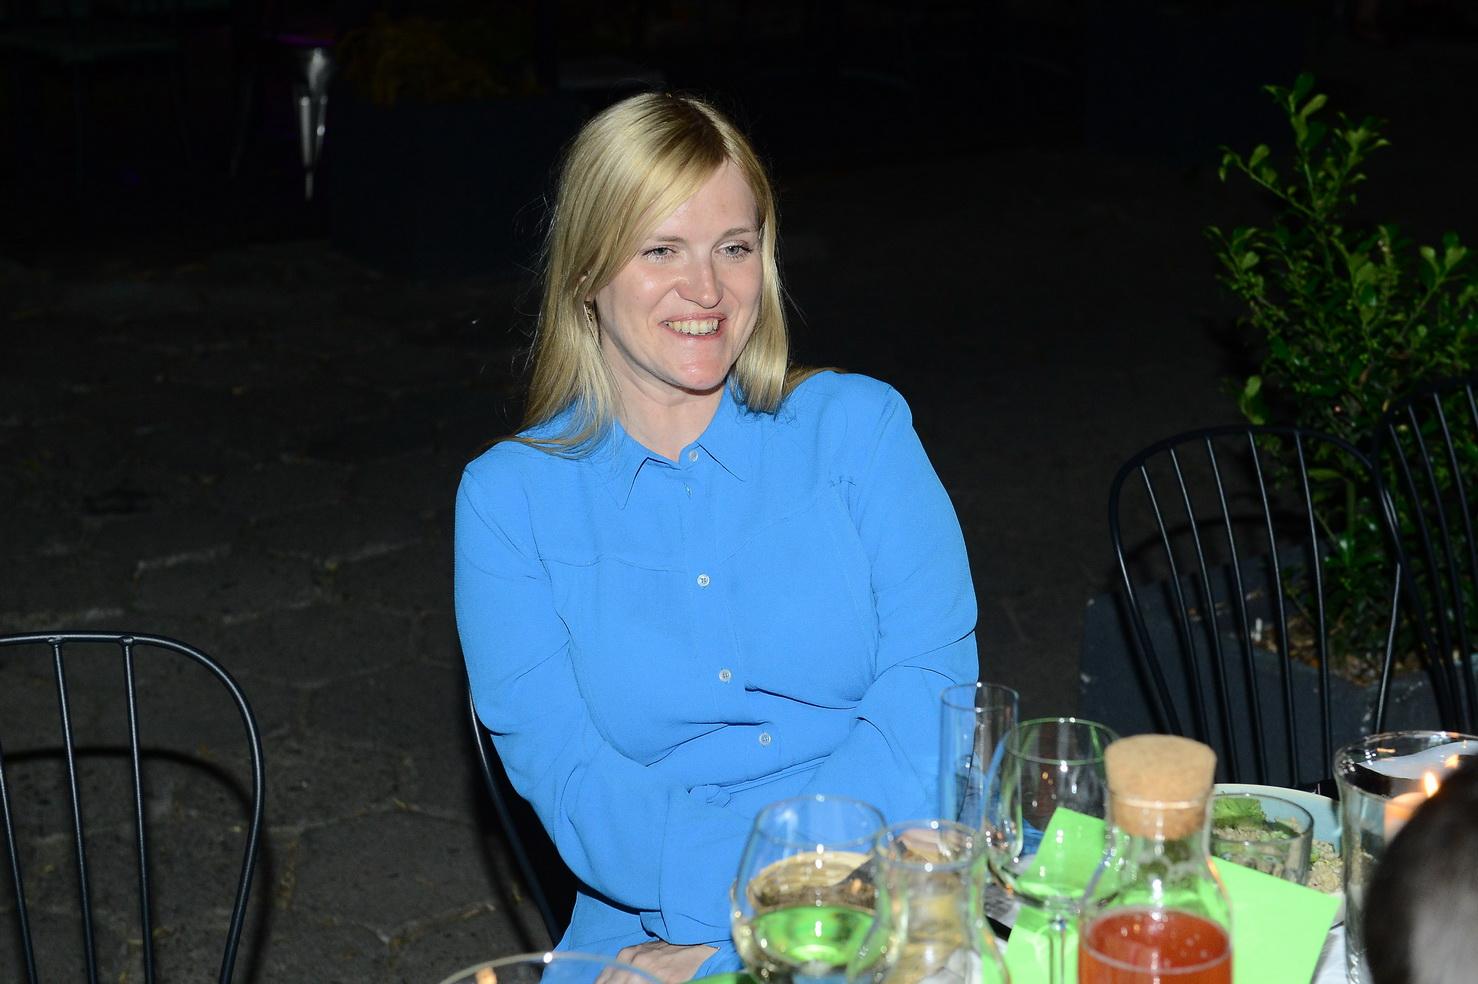 Hanna Rydlewska (Vogue)